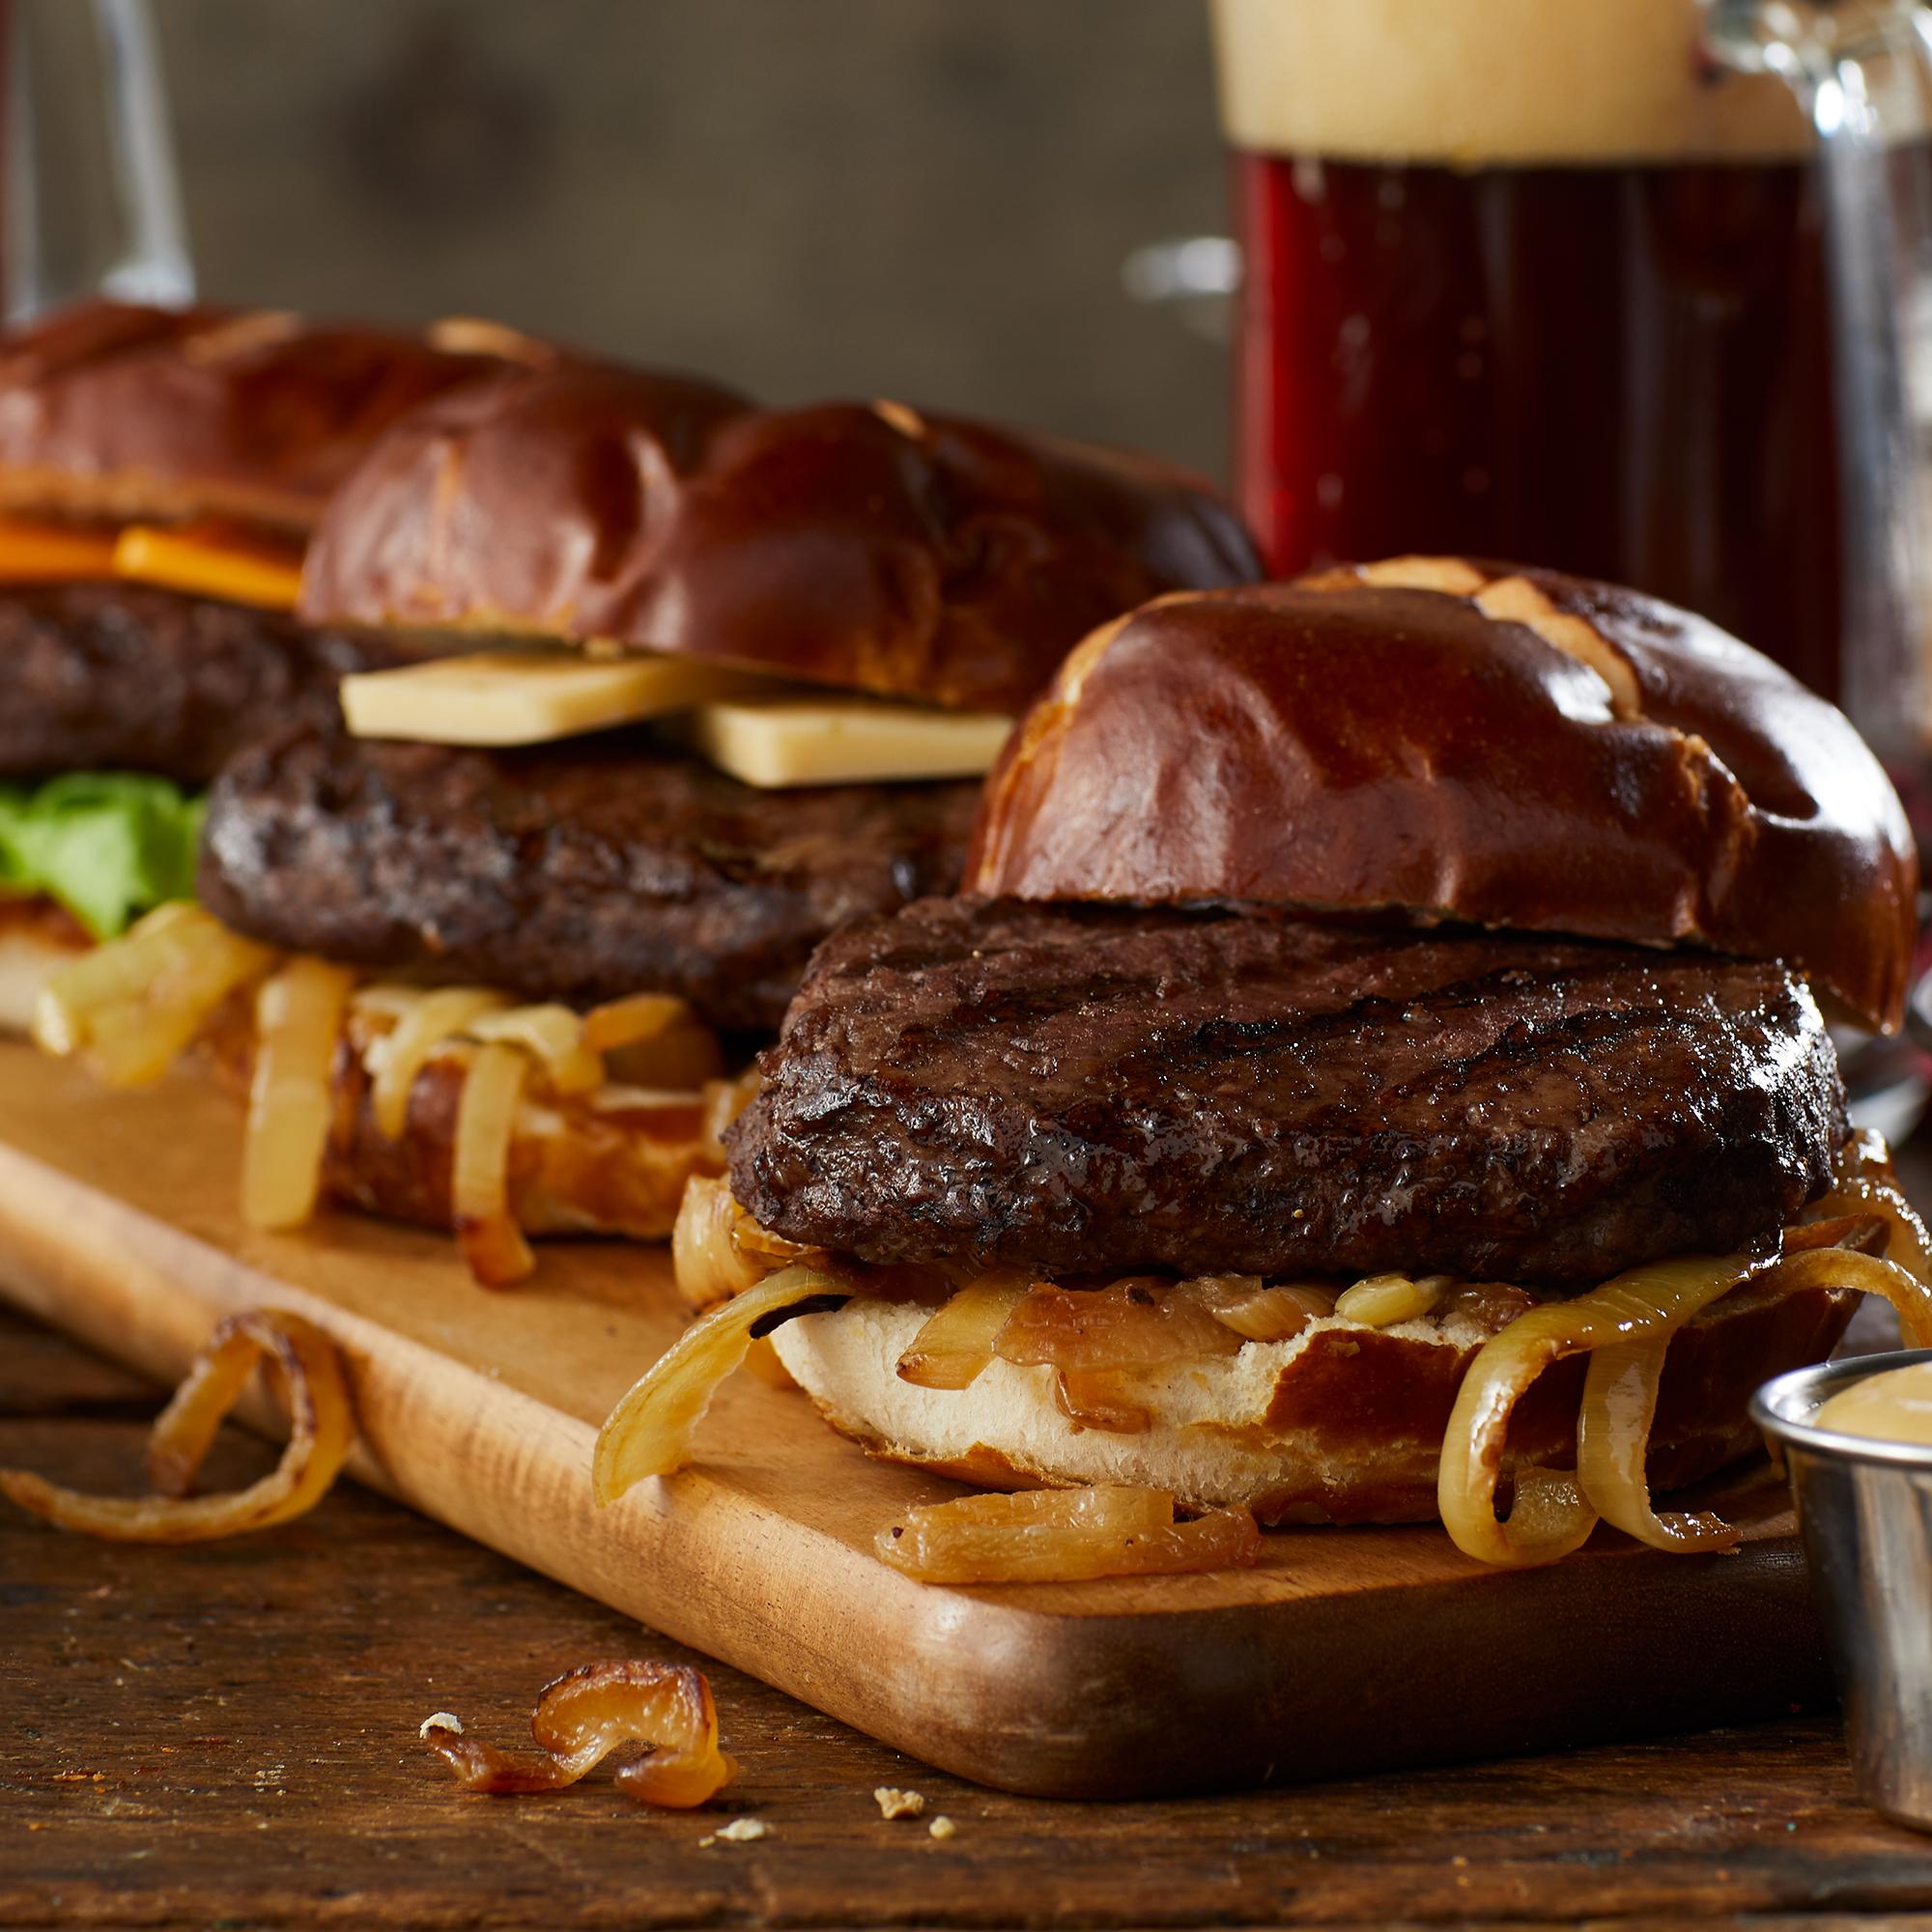 8 oz. Prime Burgers - 100% USDA Prime Chuck